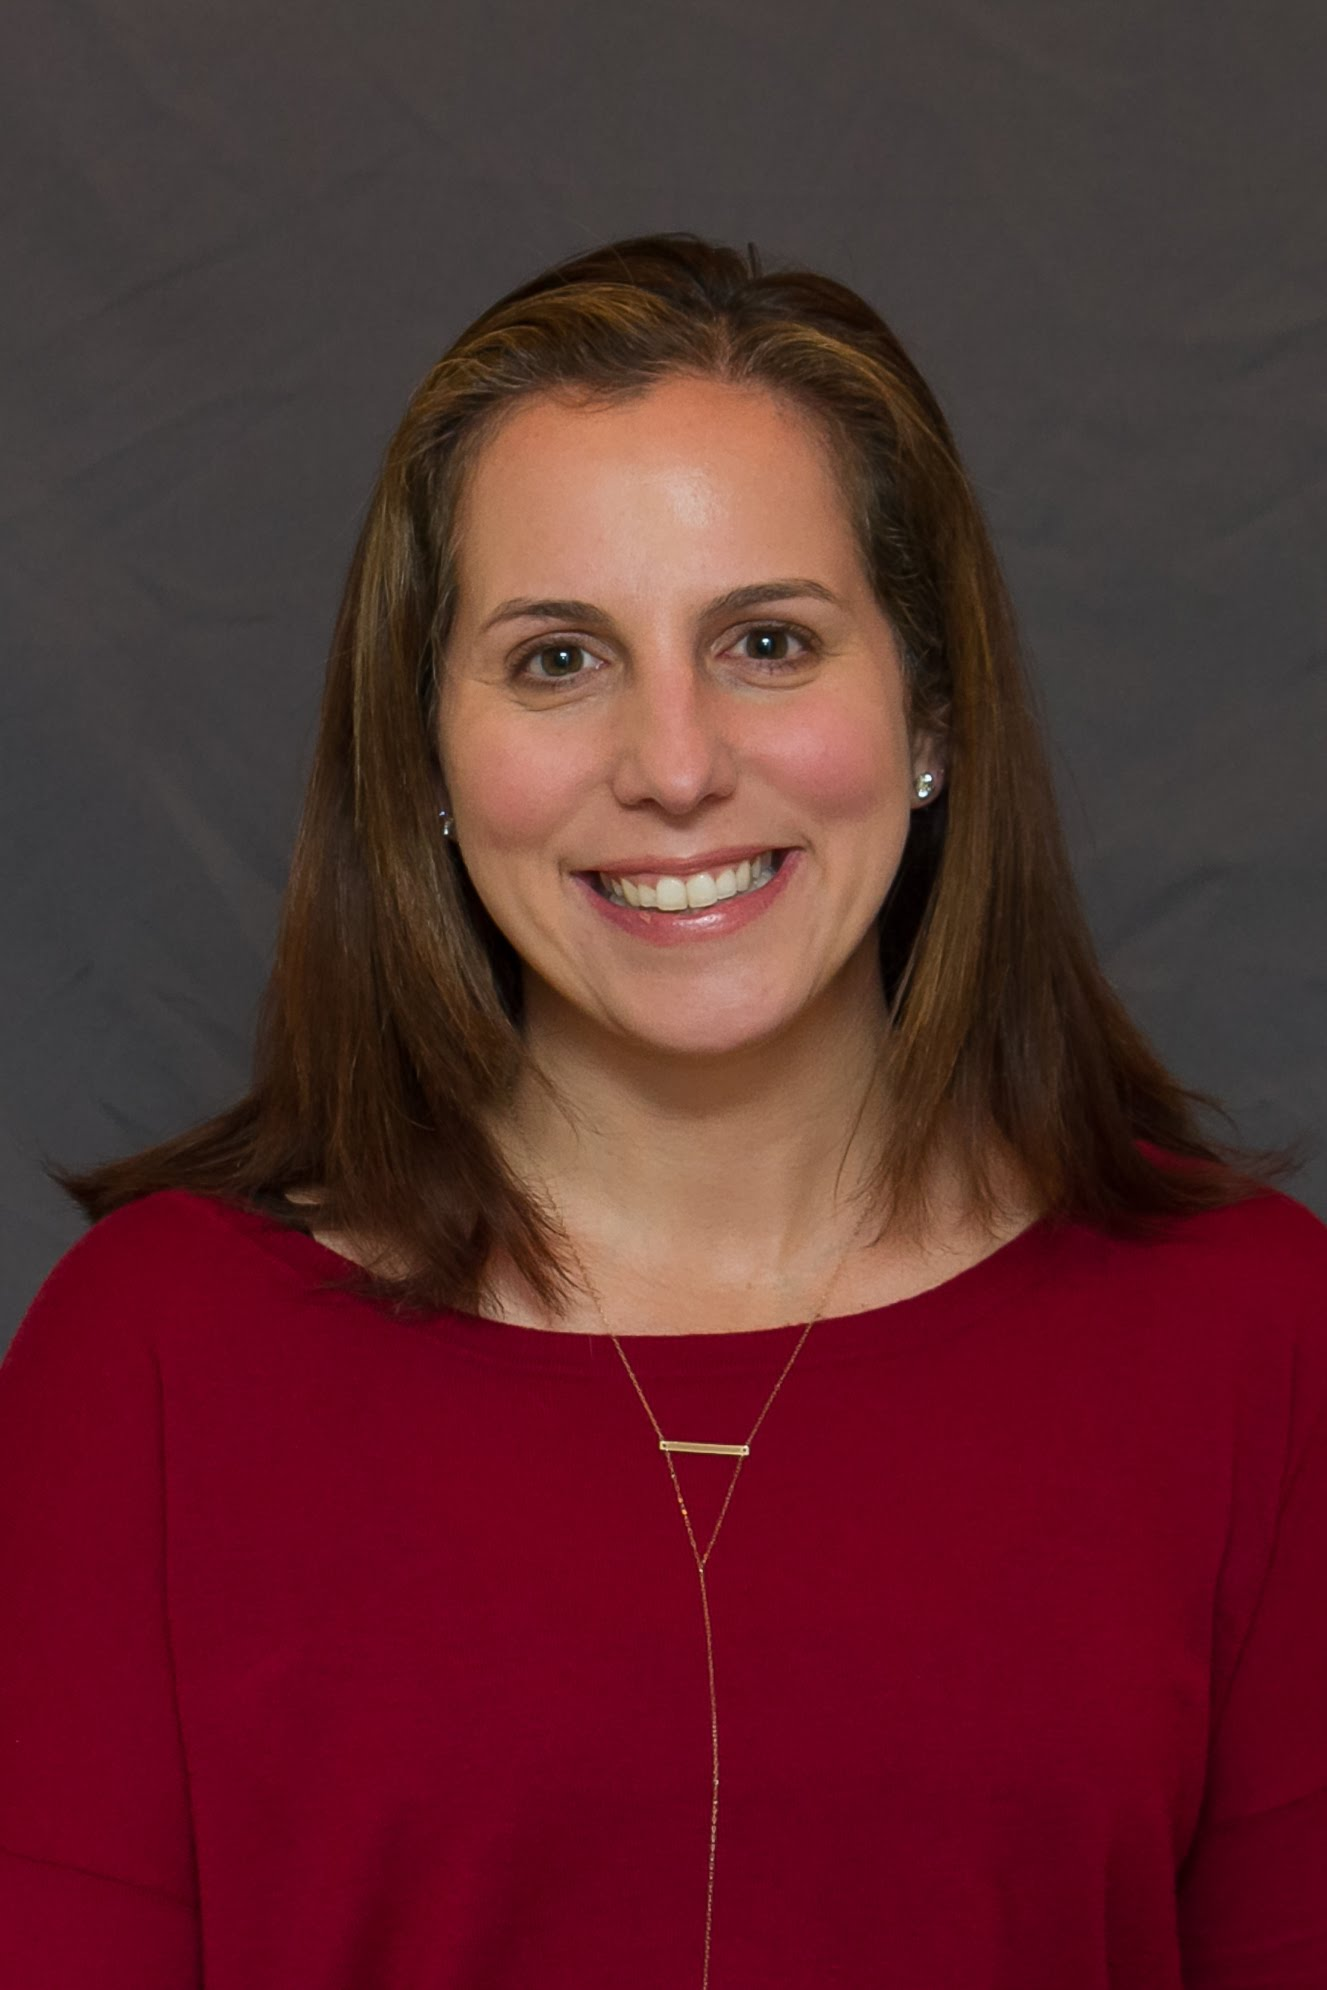 Rachel Masi, PhD